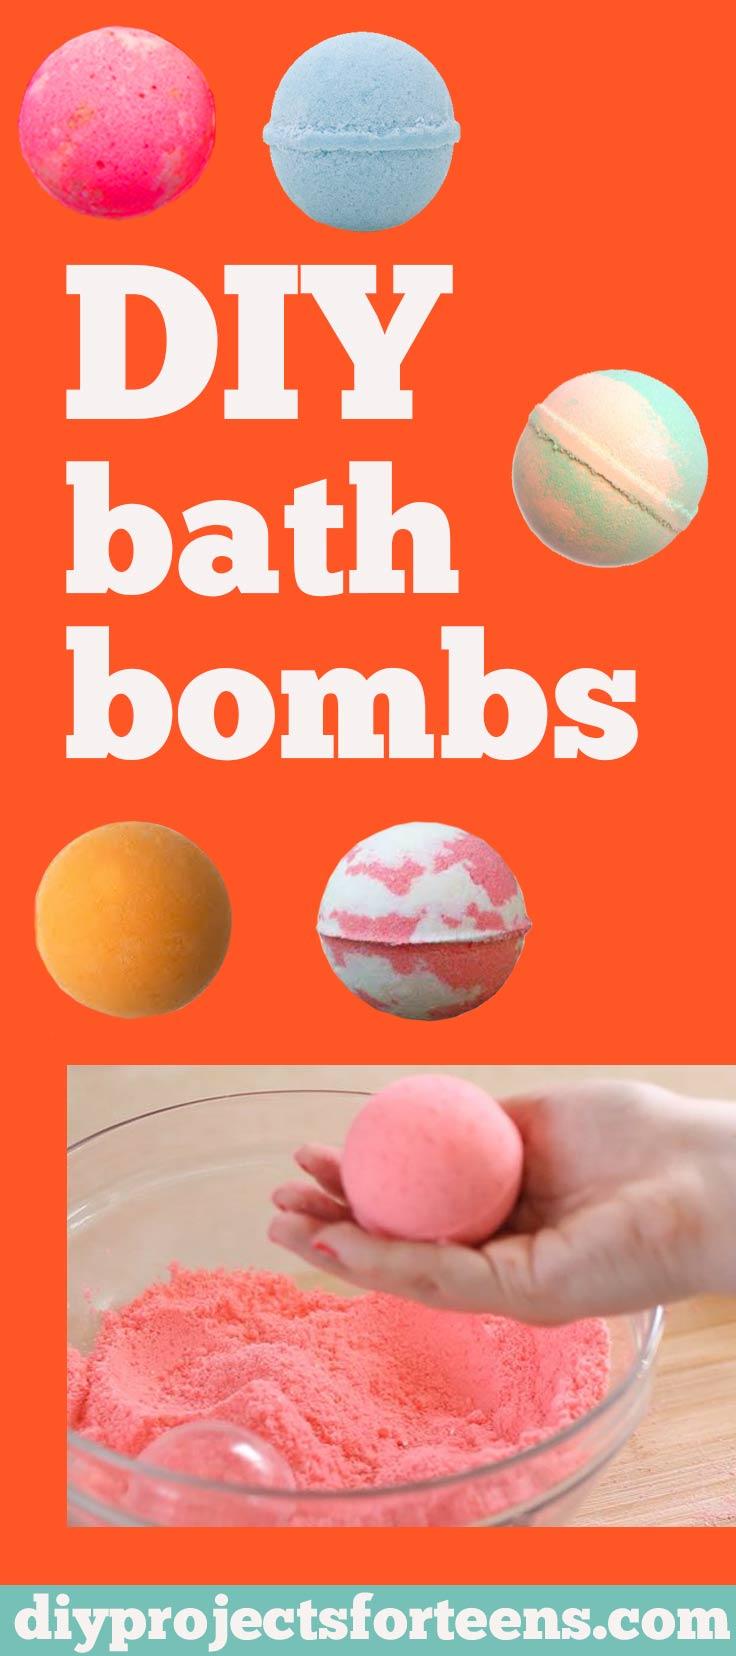 How To Make Diy Lush Bath Bombs